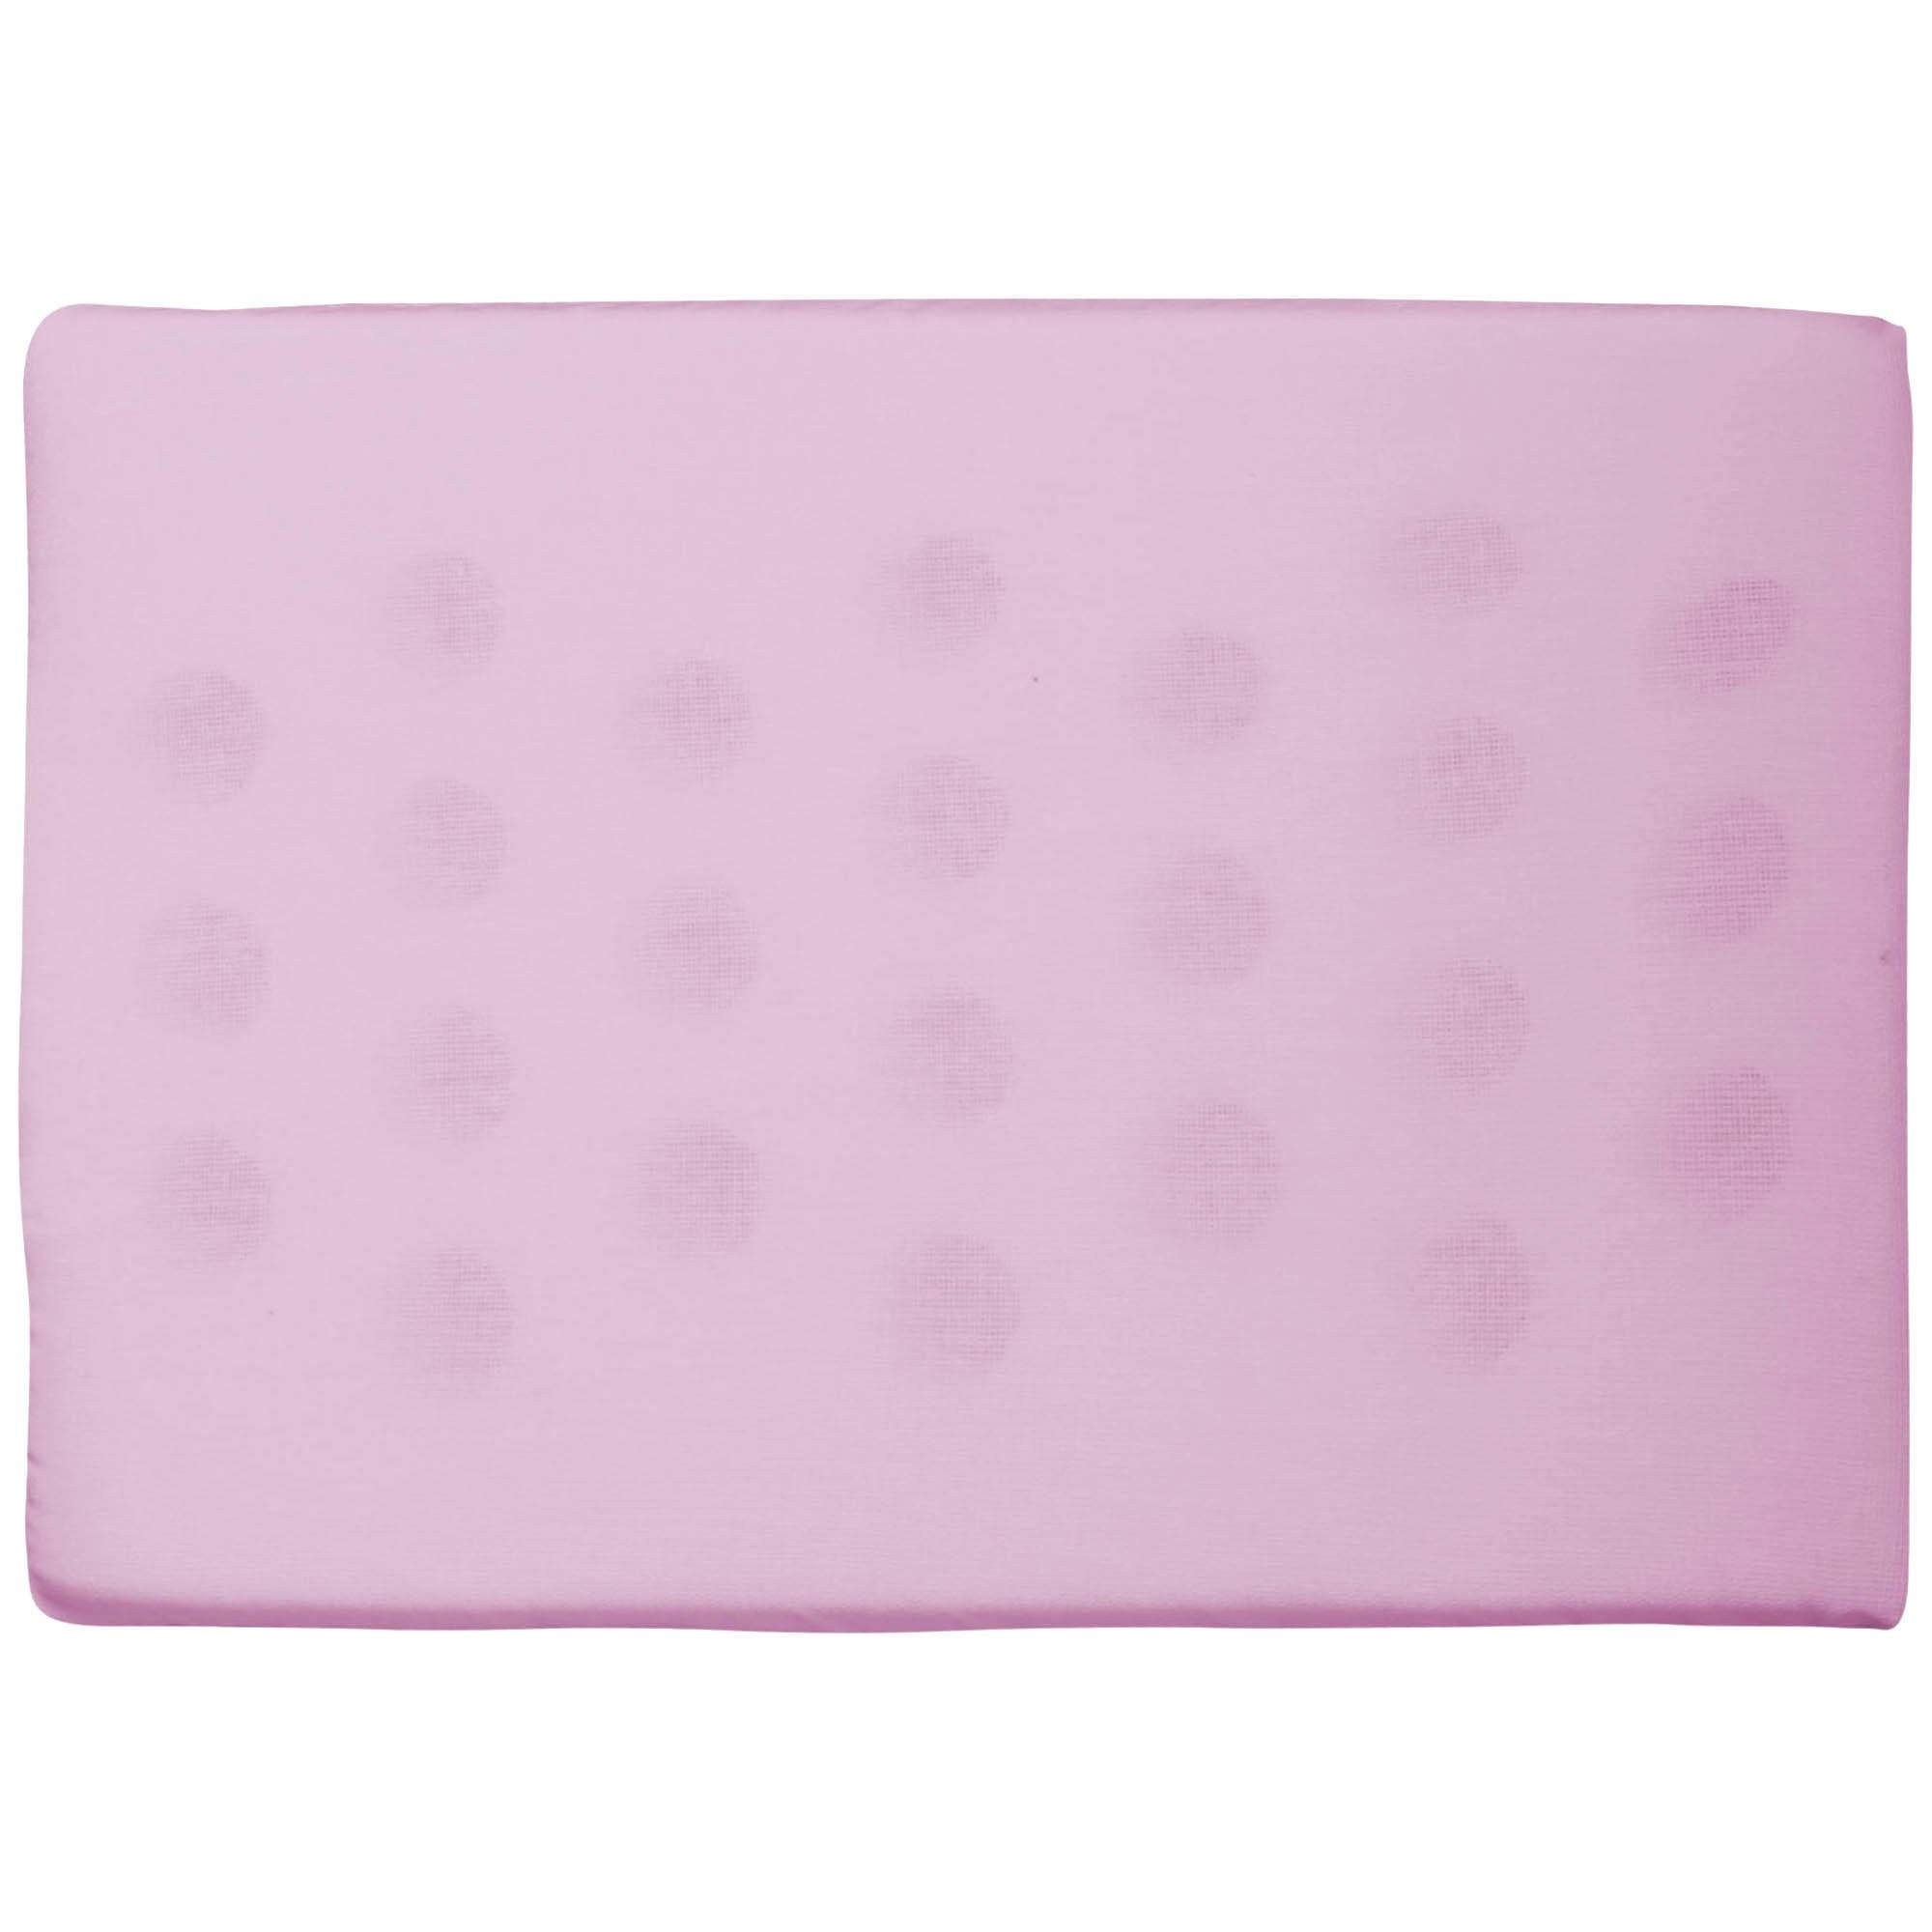 Travesseiro Antissufocante Liso - Incomfral - Bambi - Rosa